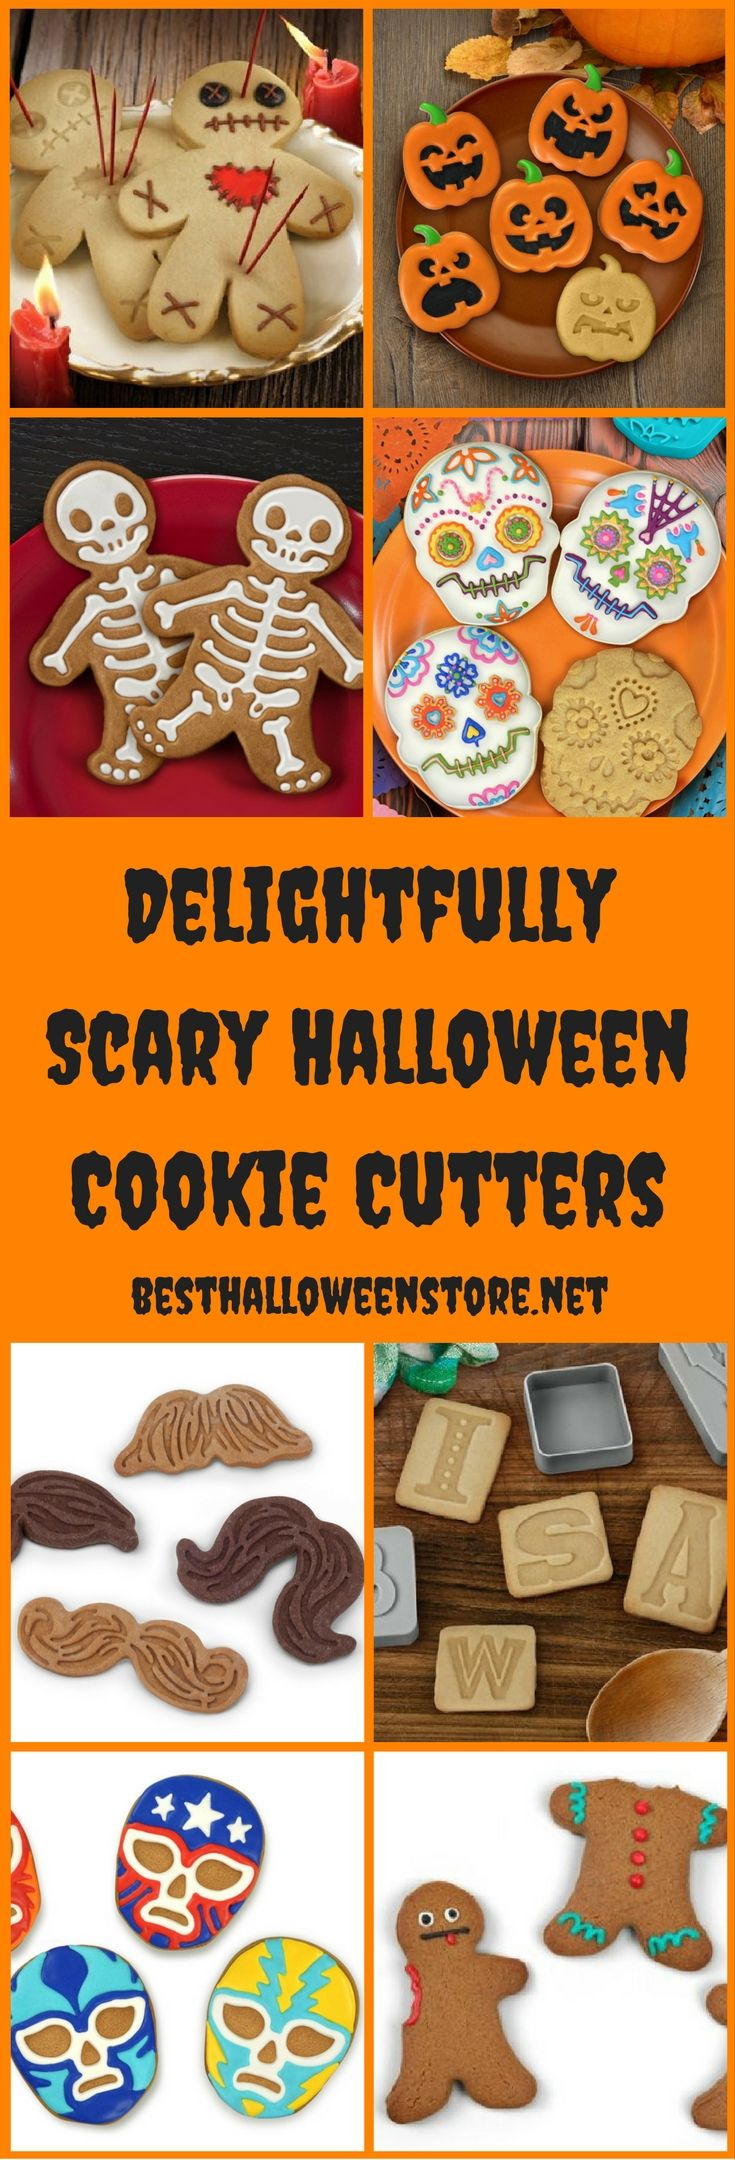 58 best halloween crafts + food images on pinterest | halloween